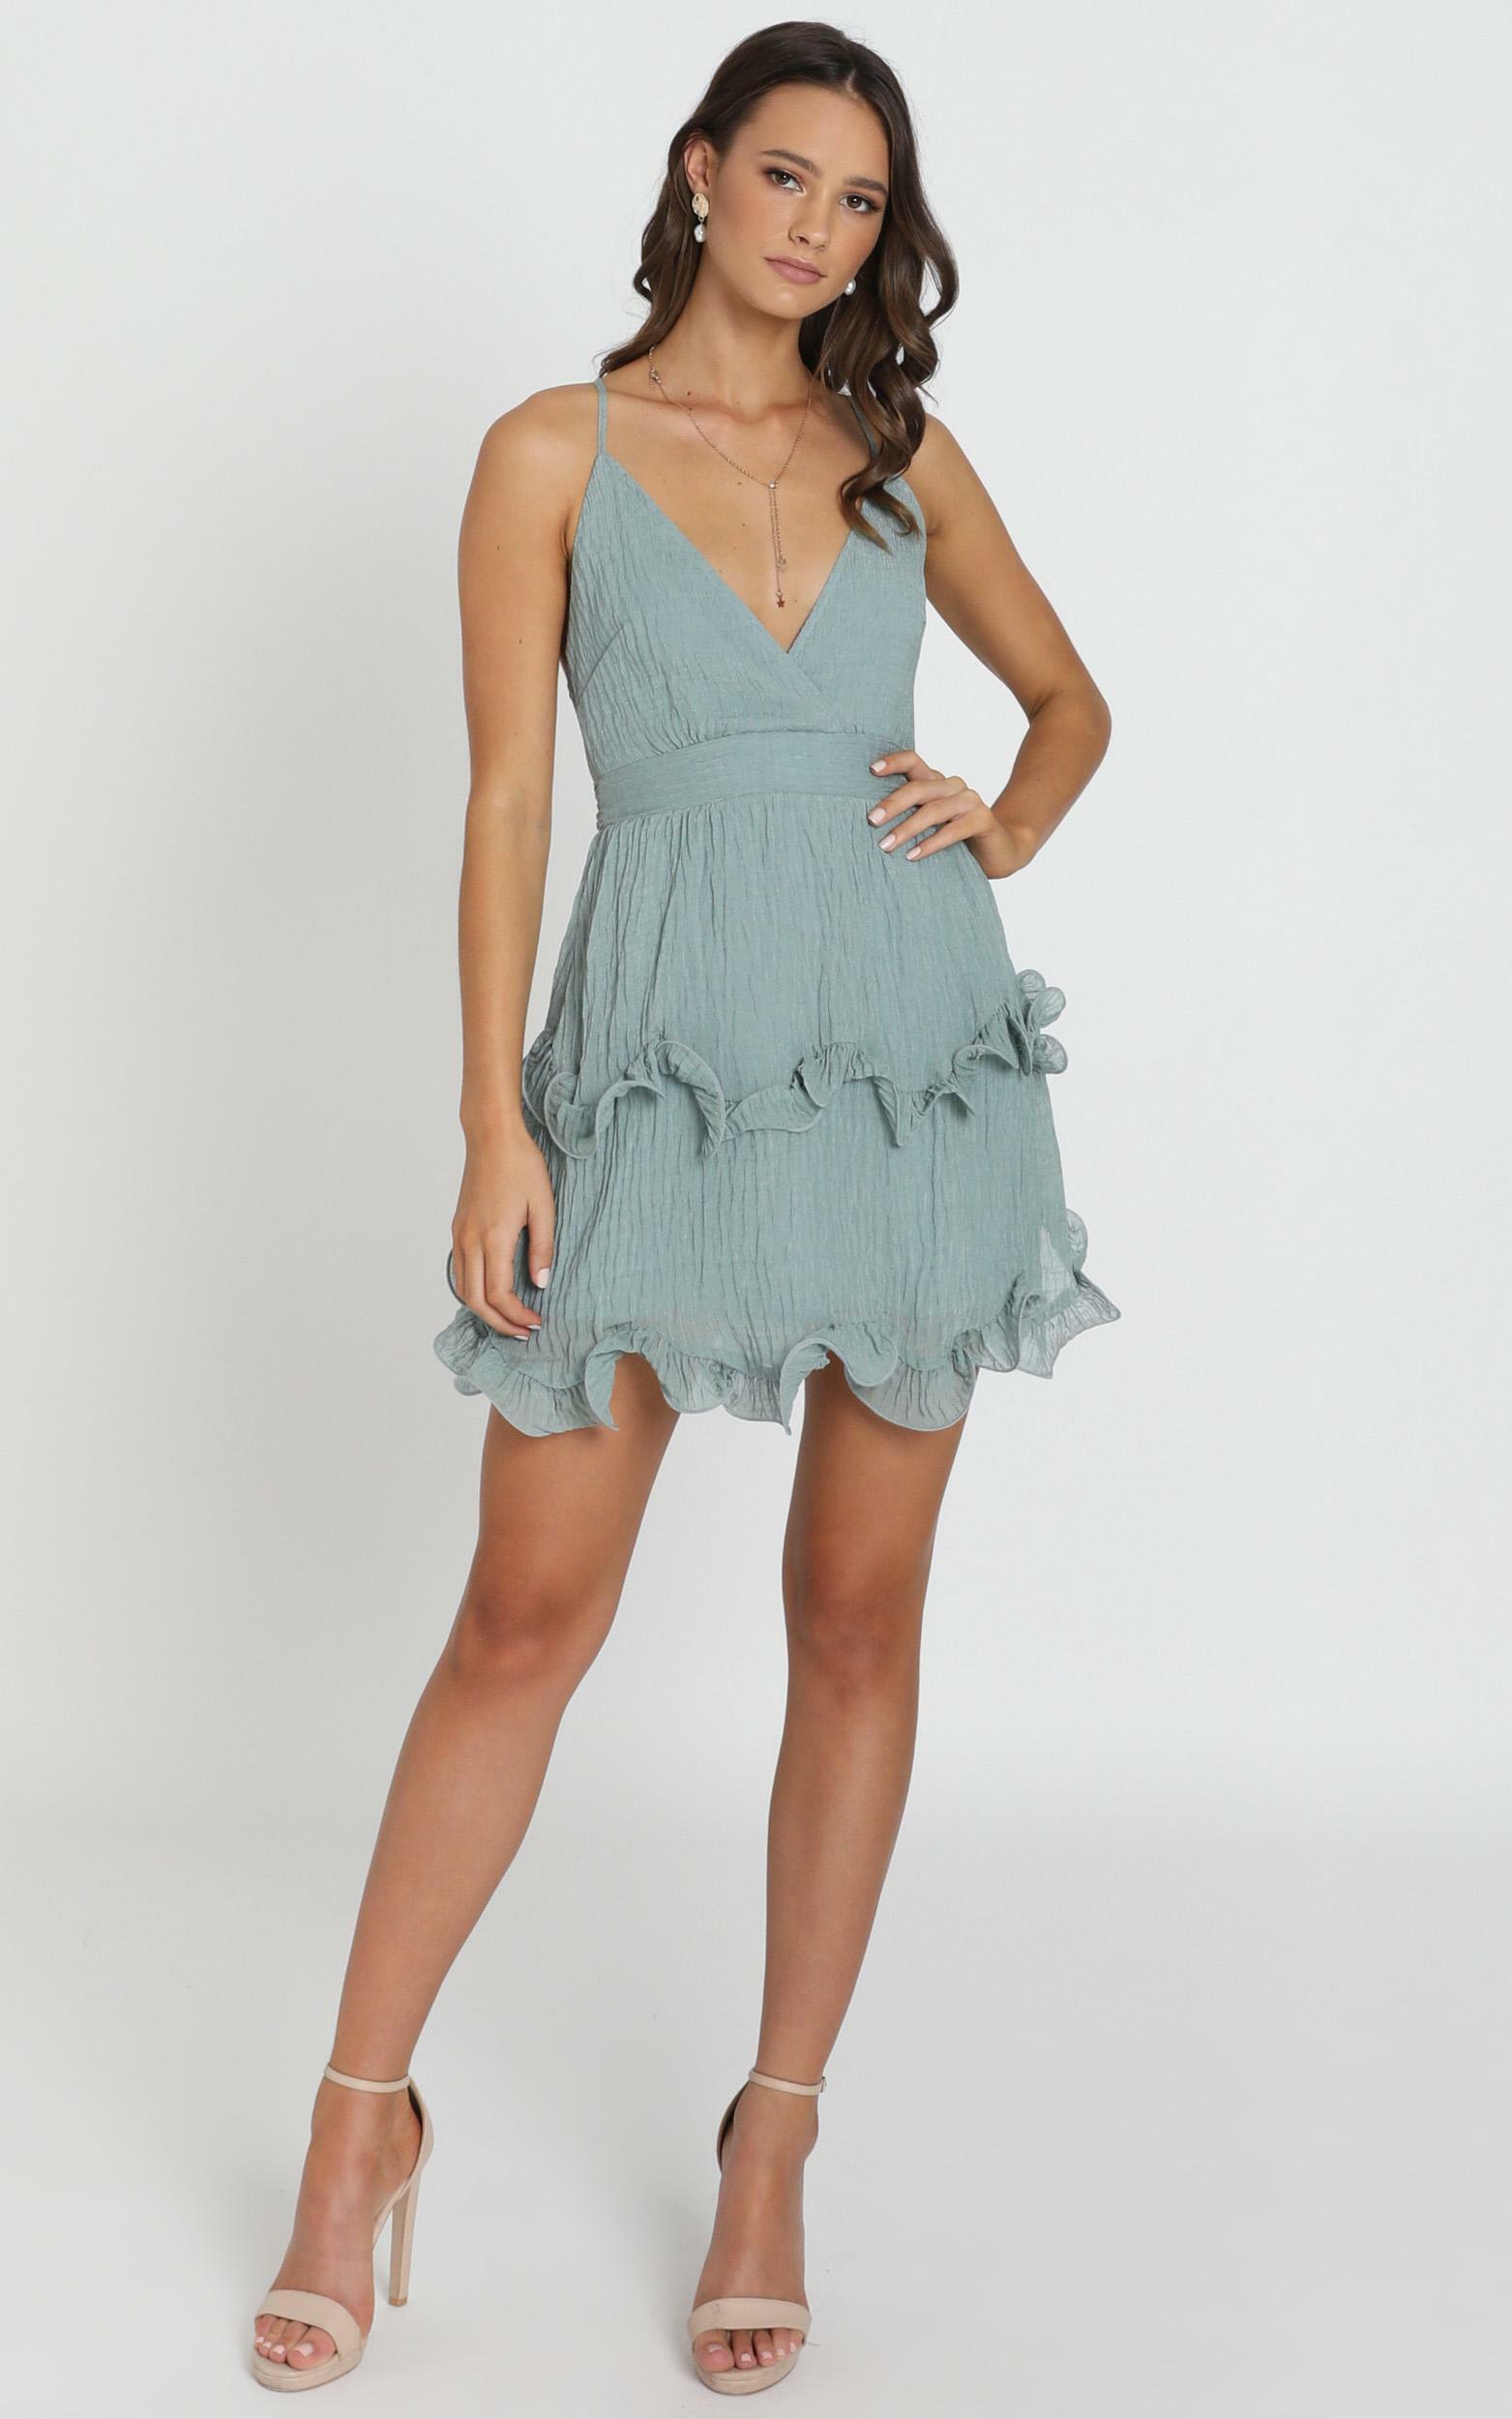 Moving On Up Mini Dress In olive - 12 (L), Blue, hi-res image number null